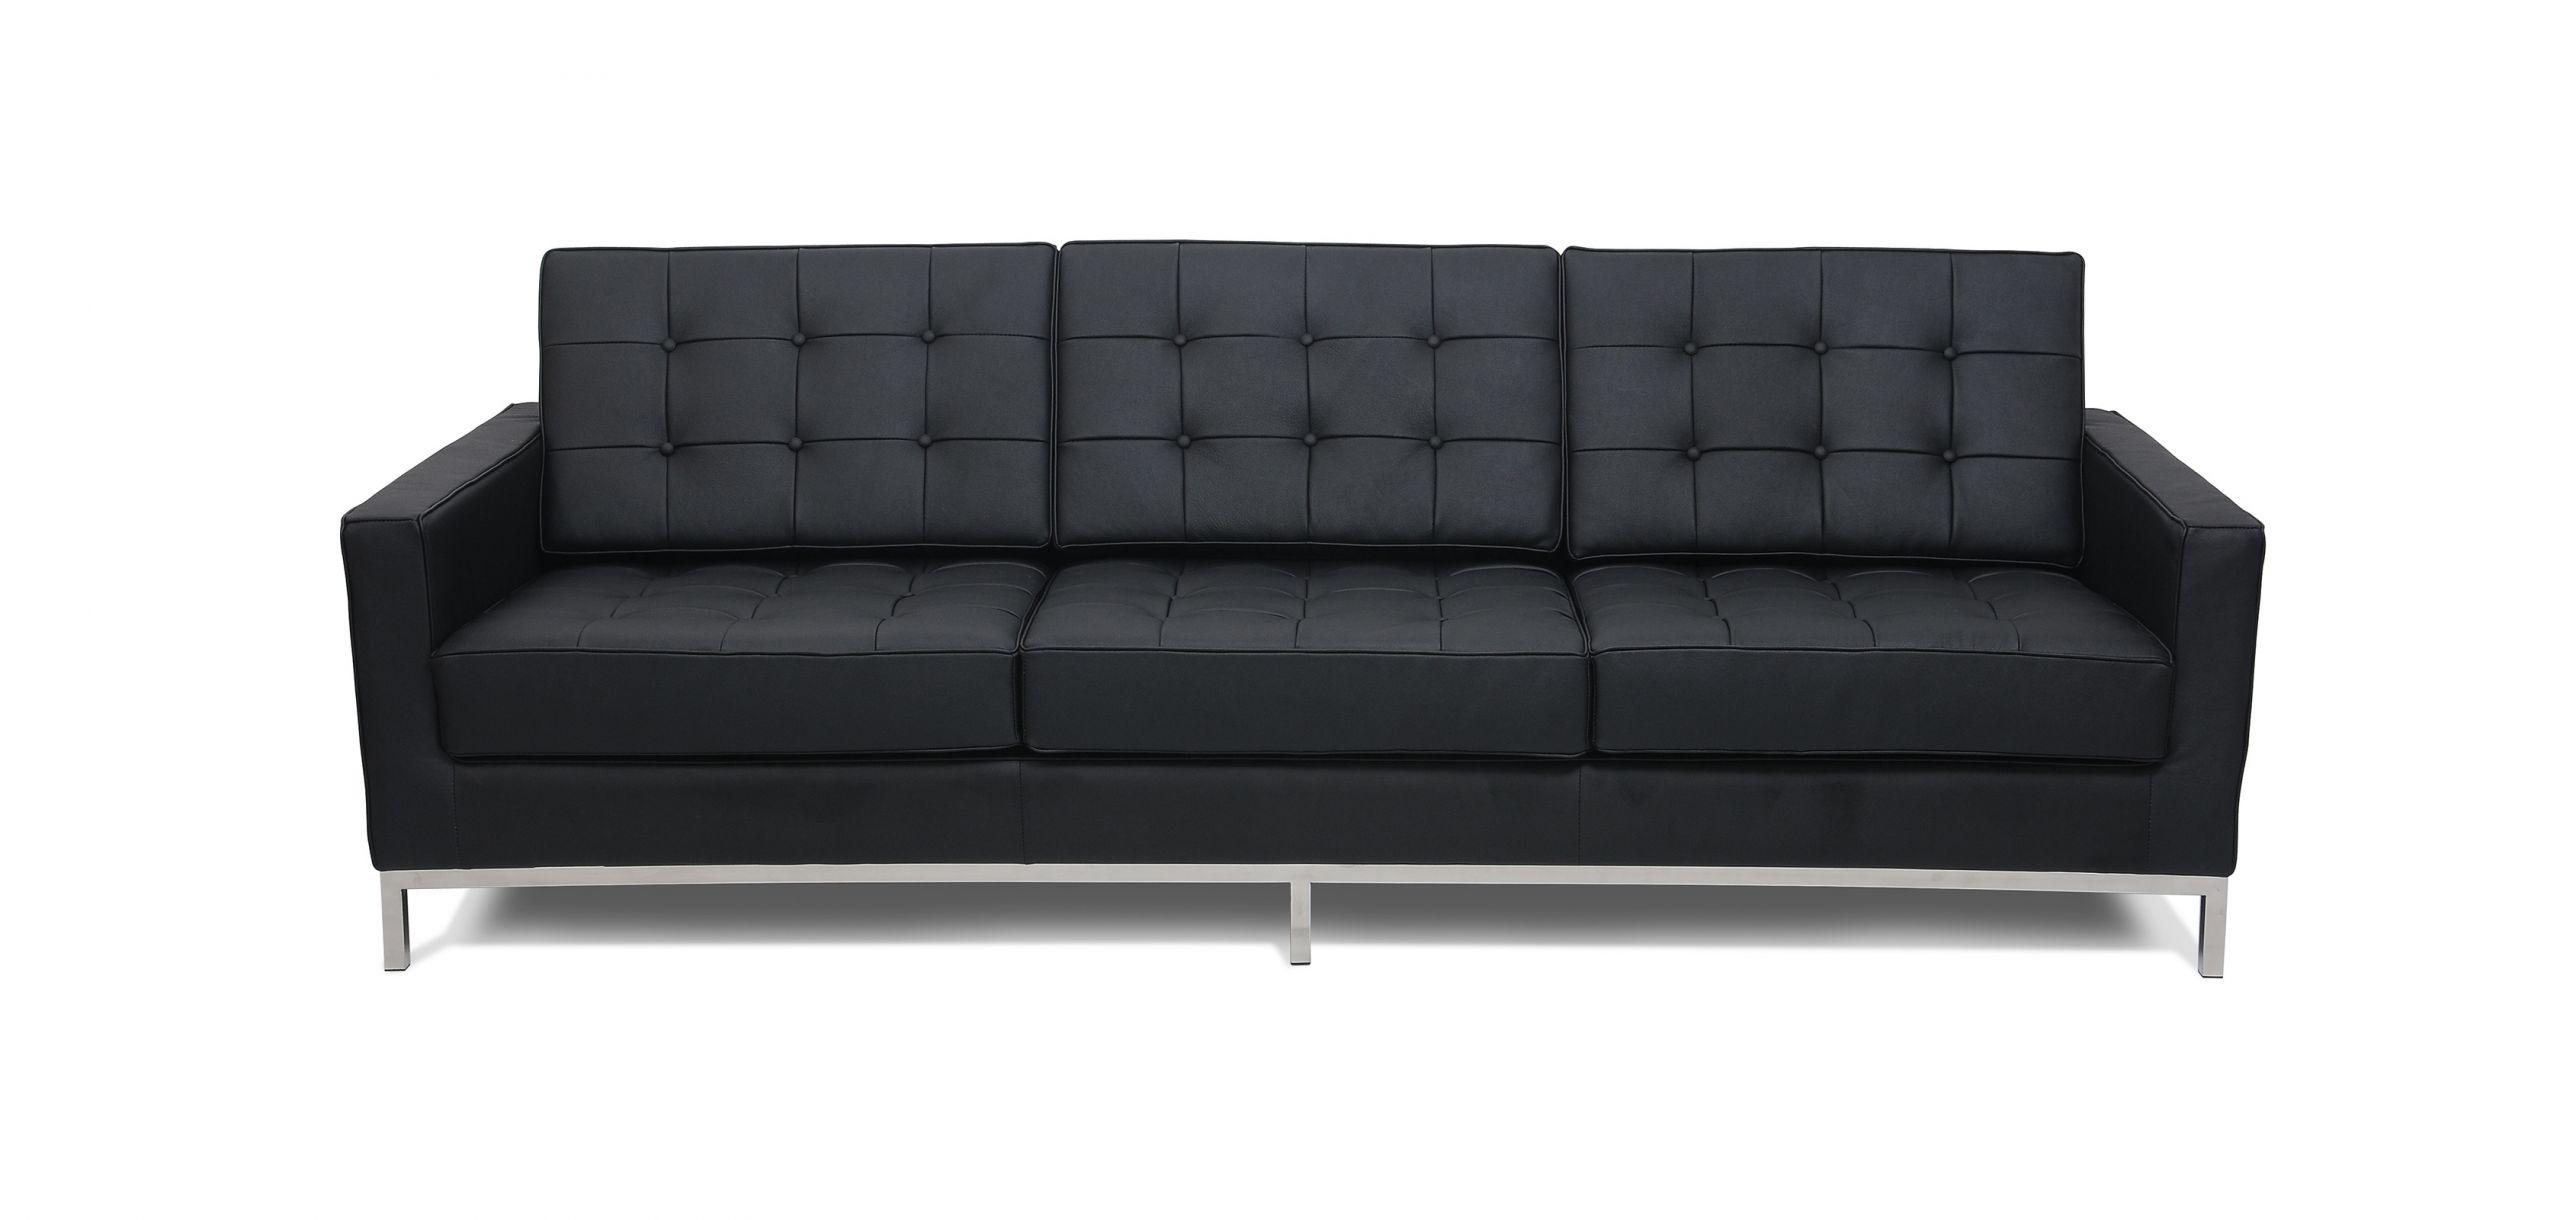 Canapé 3 places Style Florence Knoll Simili Cuir pas